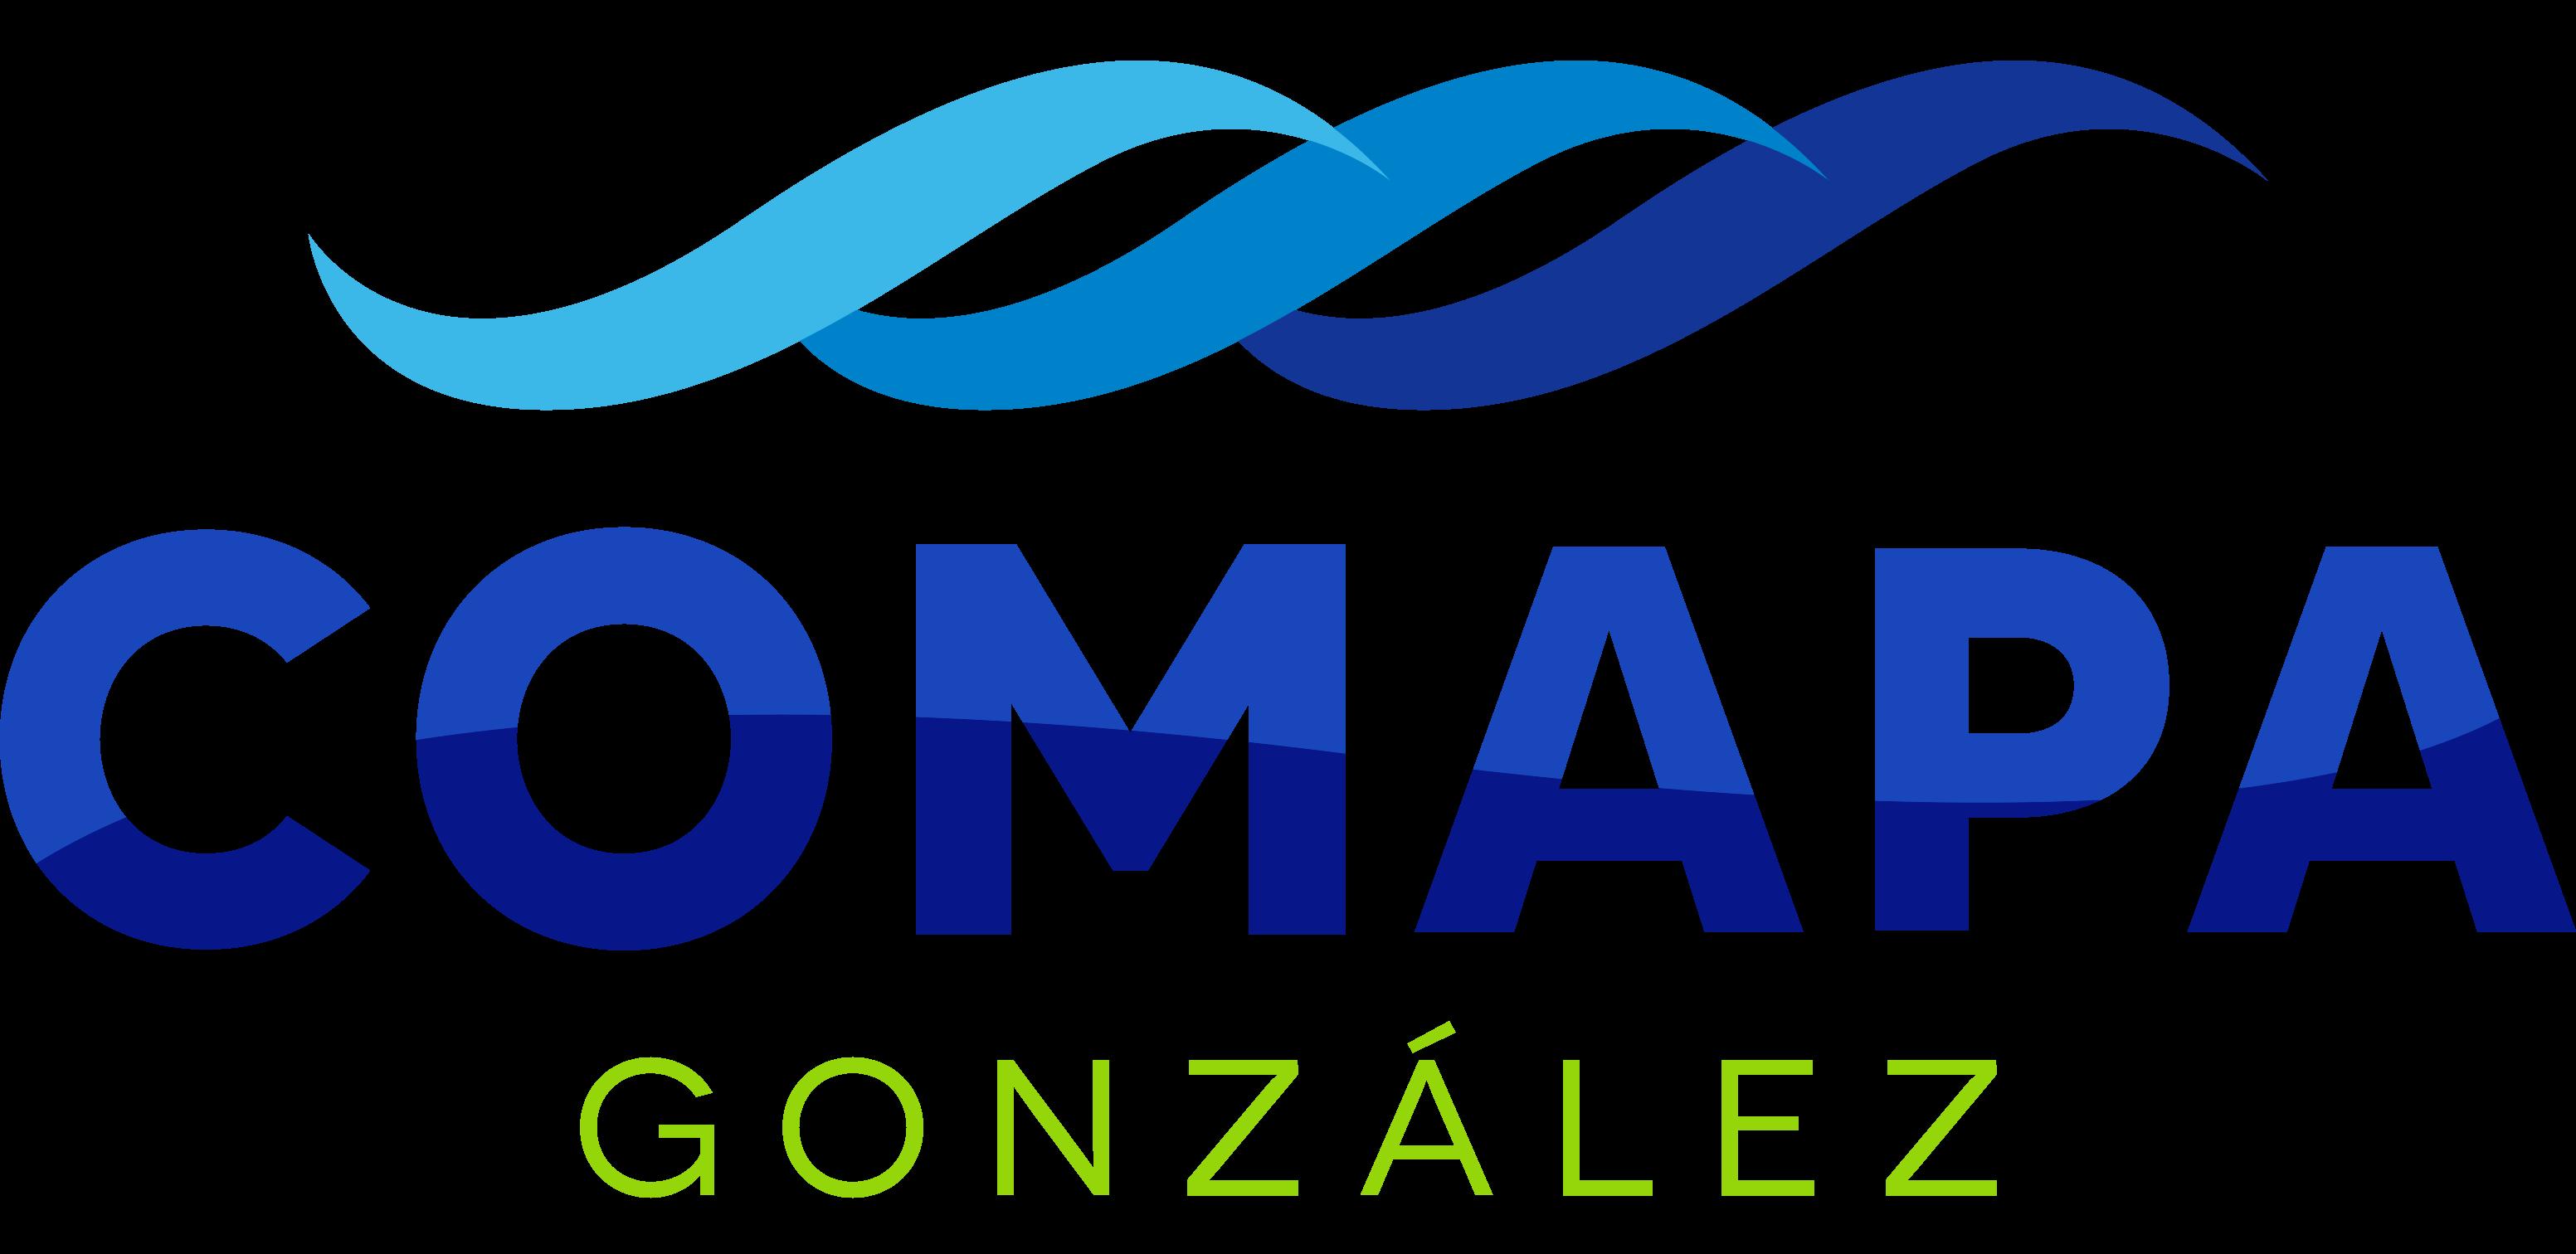 COMAPA GONZALEZ